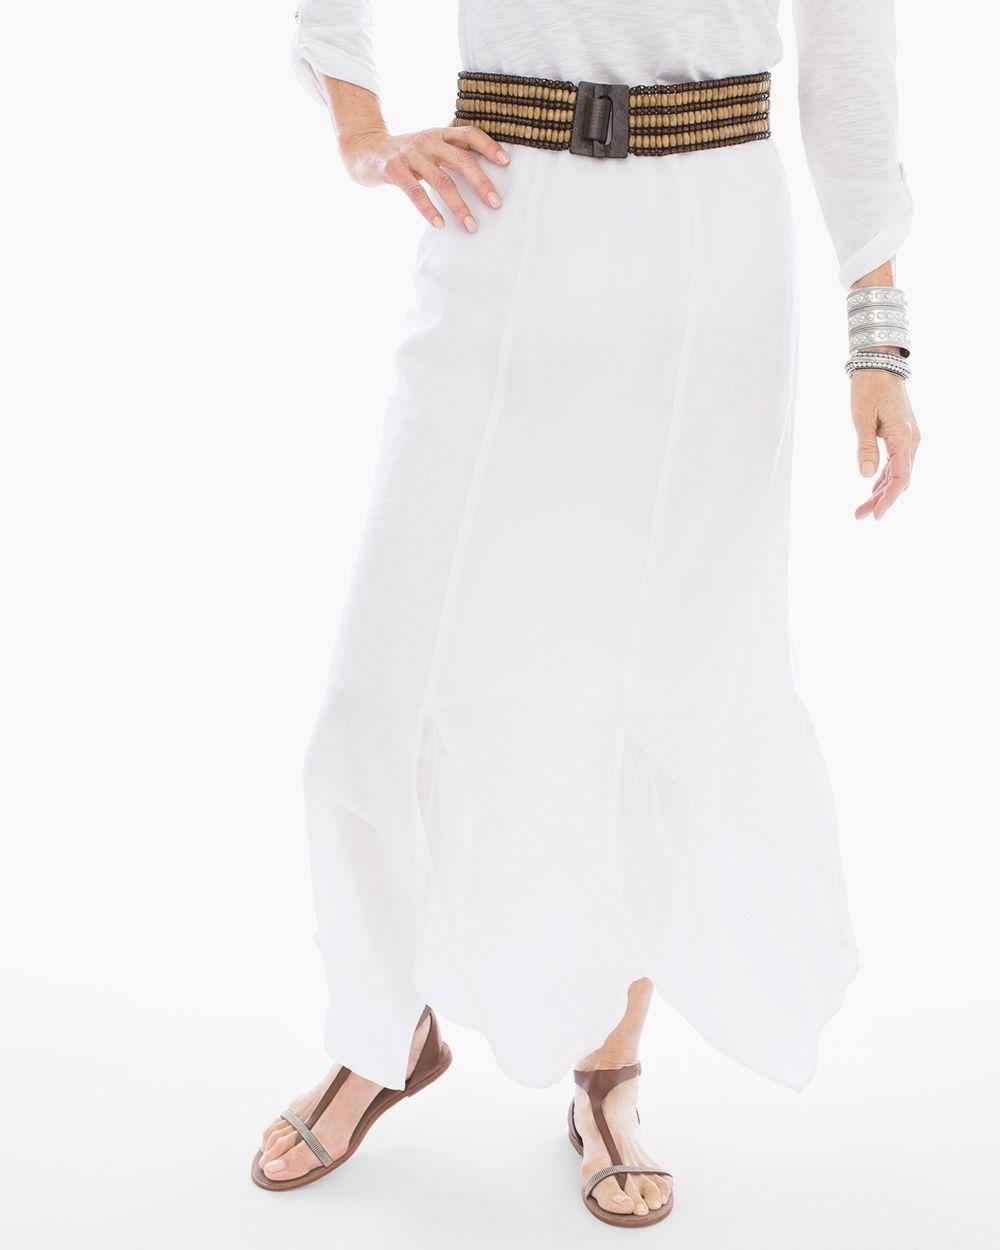 9a2daf2959 Chico's Women's Handkerchief Hem Maxi Skirt